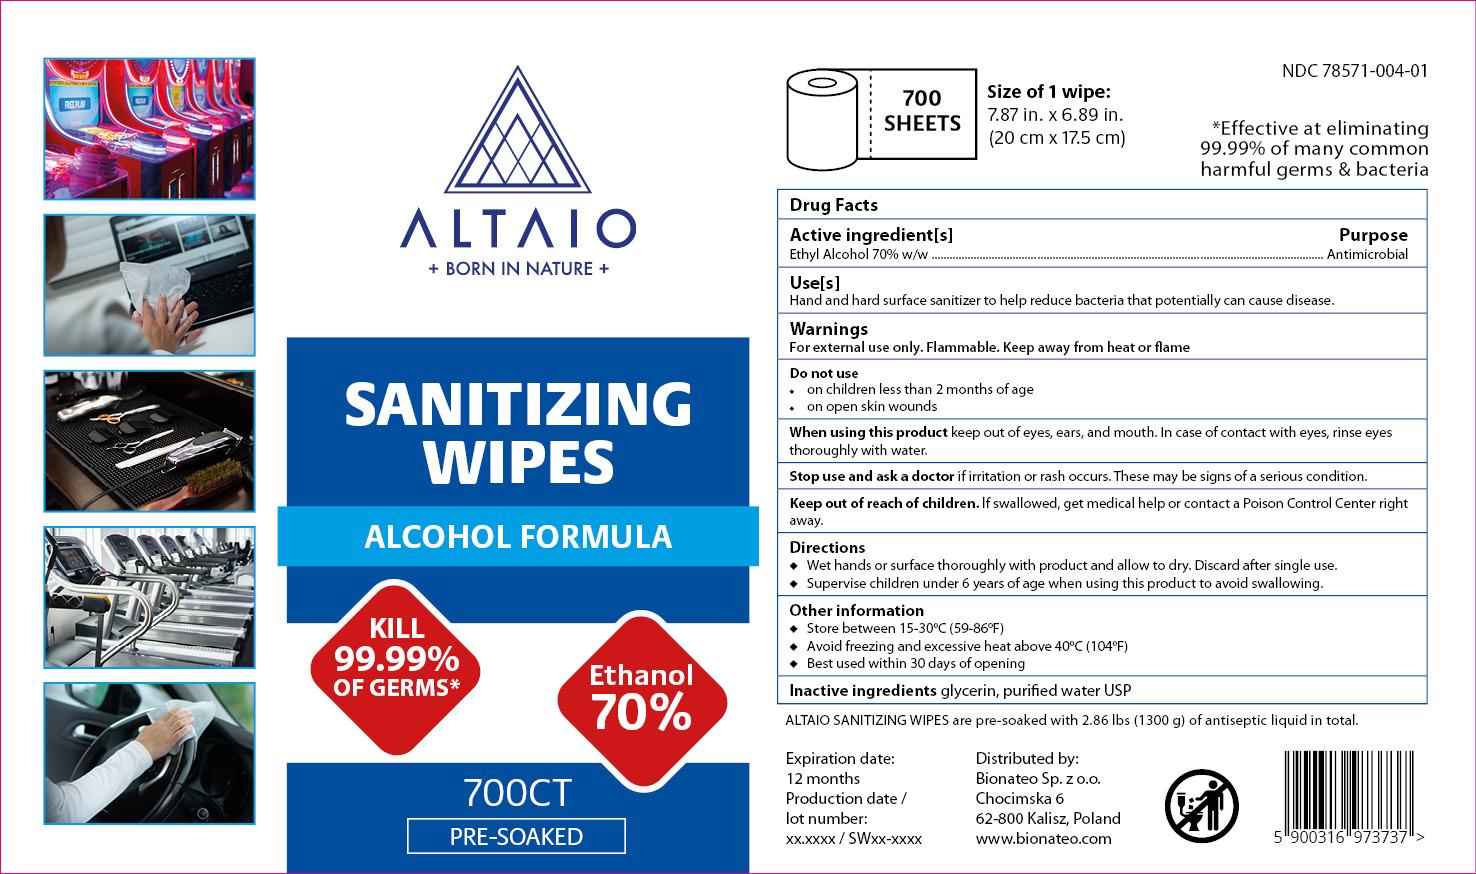 ALTAIO Sanitizing Wipes